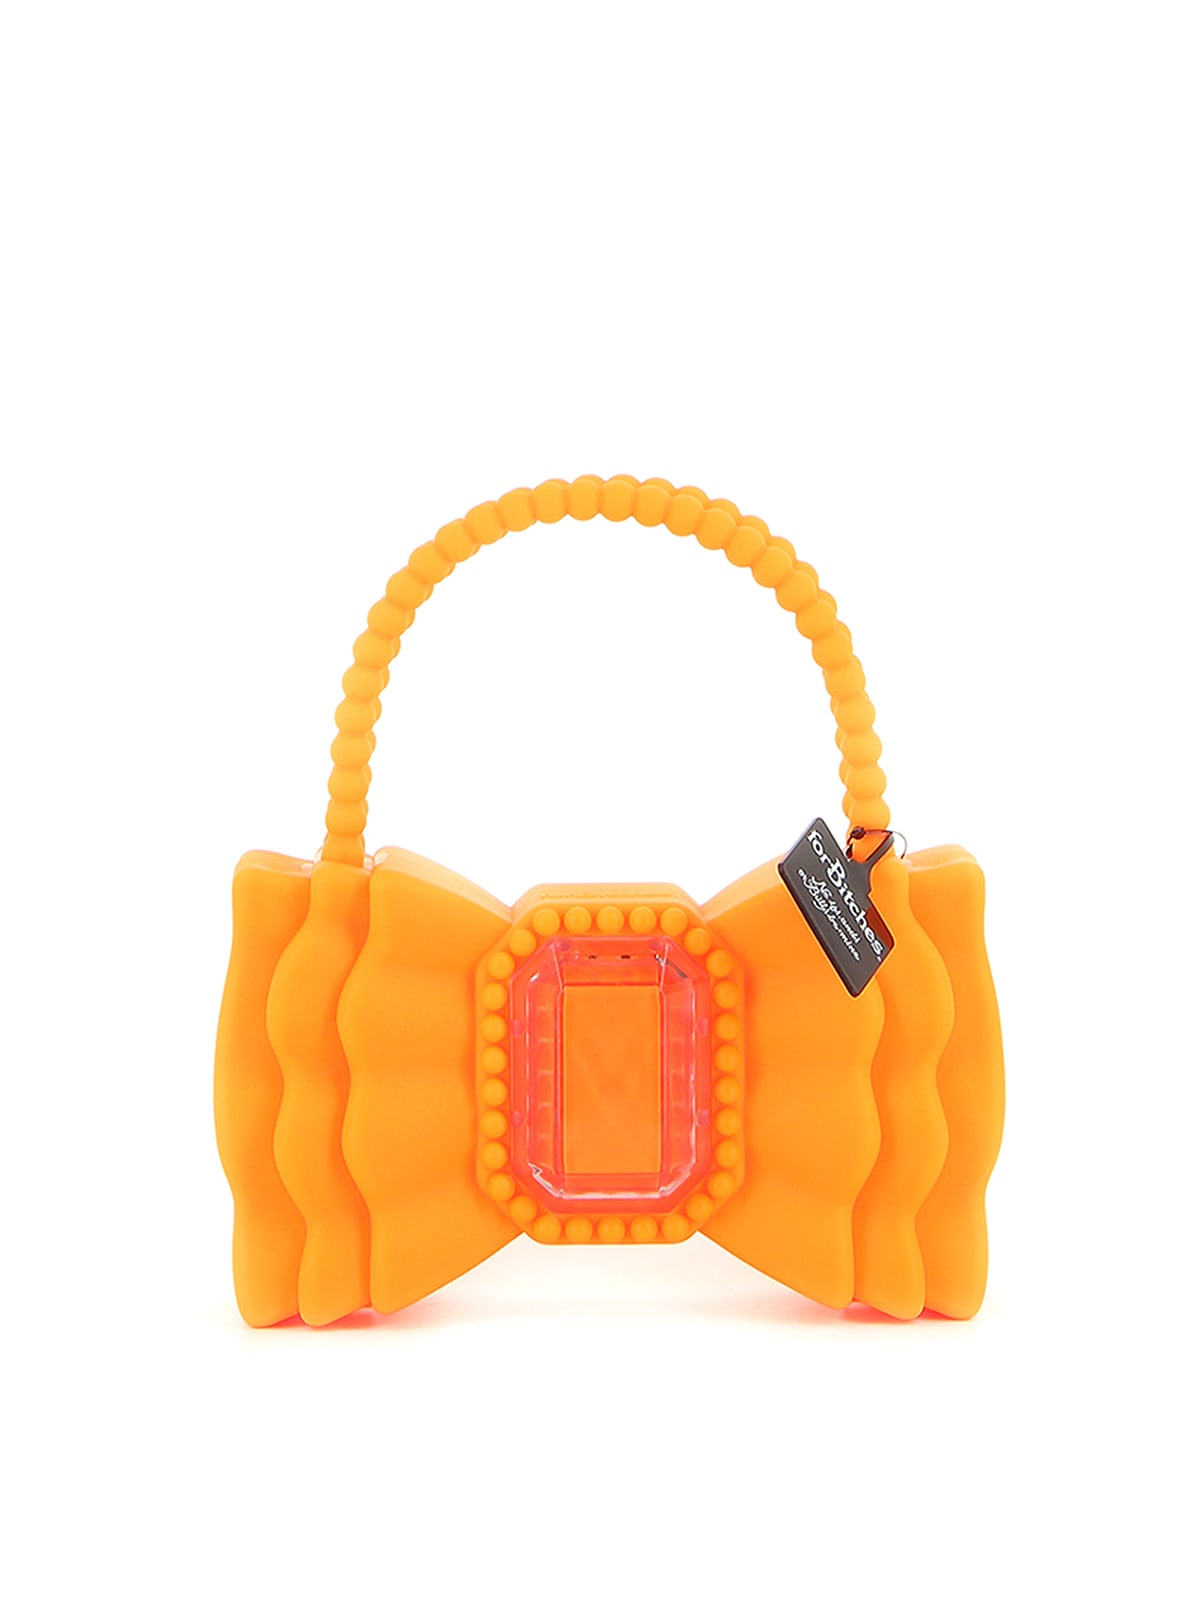 Bow Bag 9 Inch